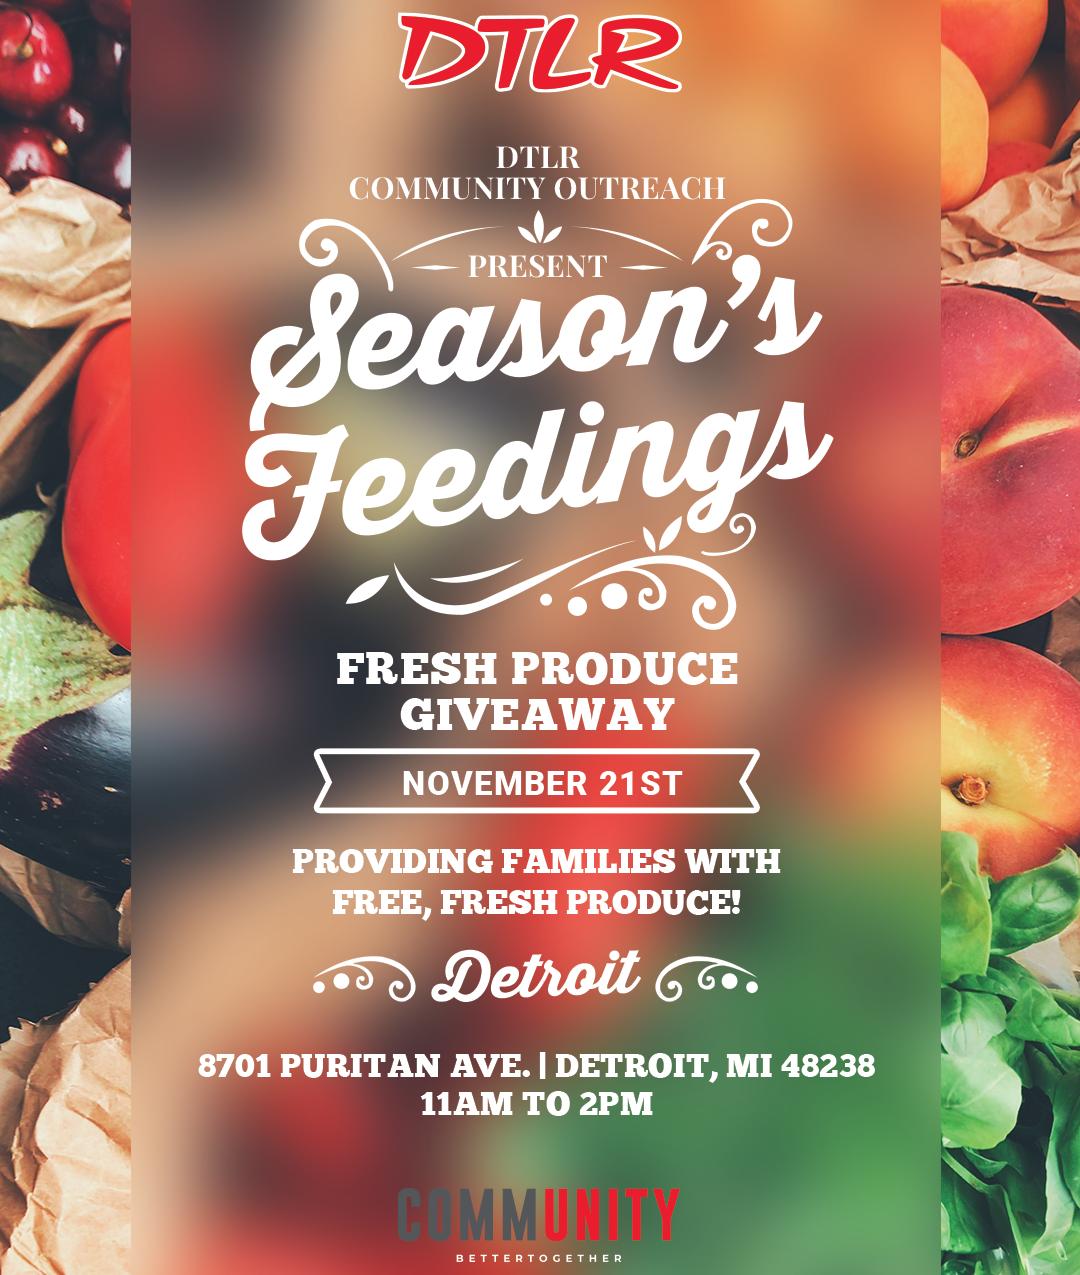 Food Drive Flyer - IG Post - Detroit